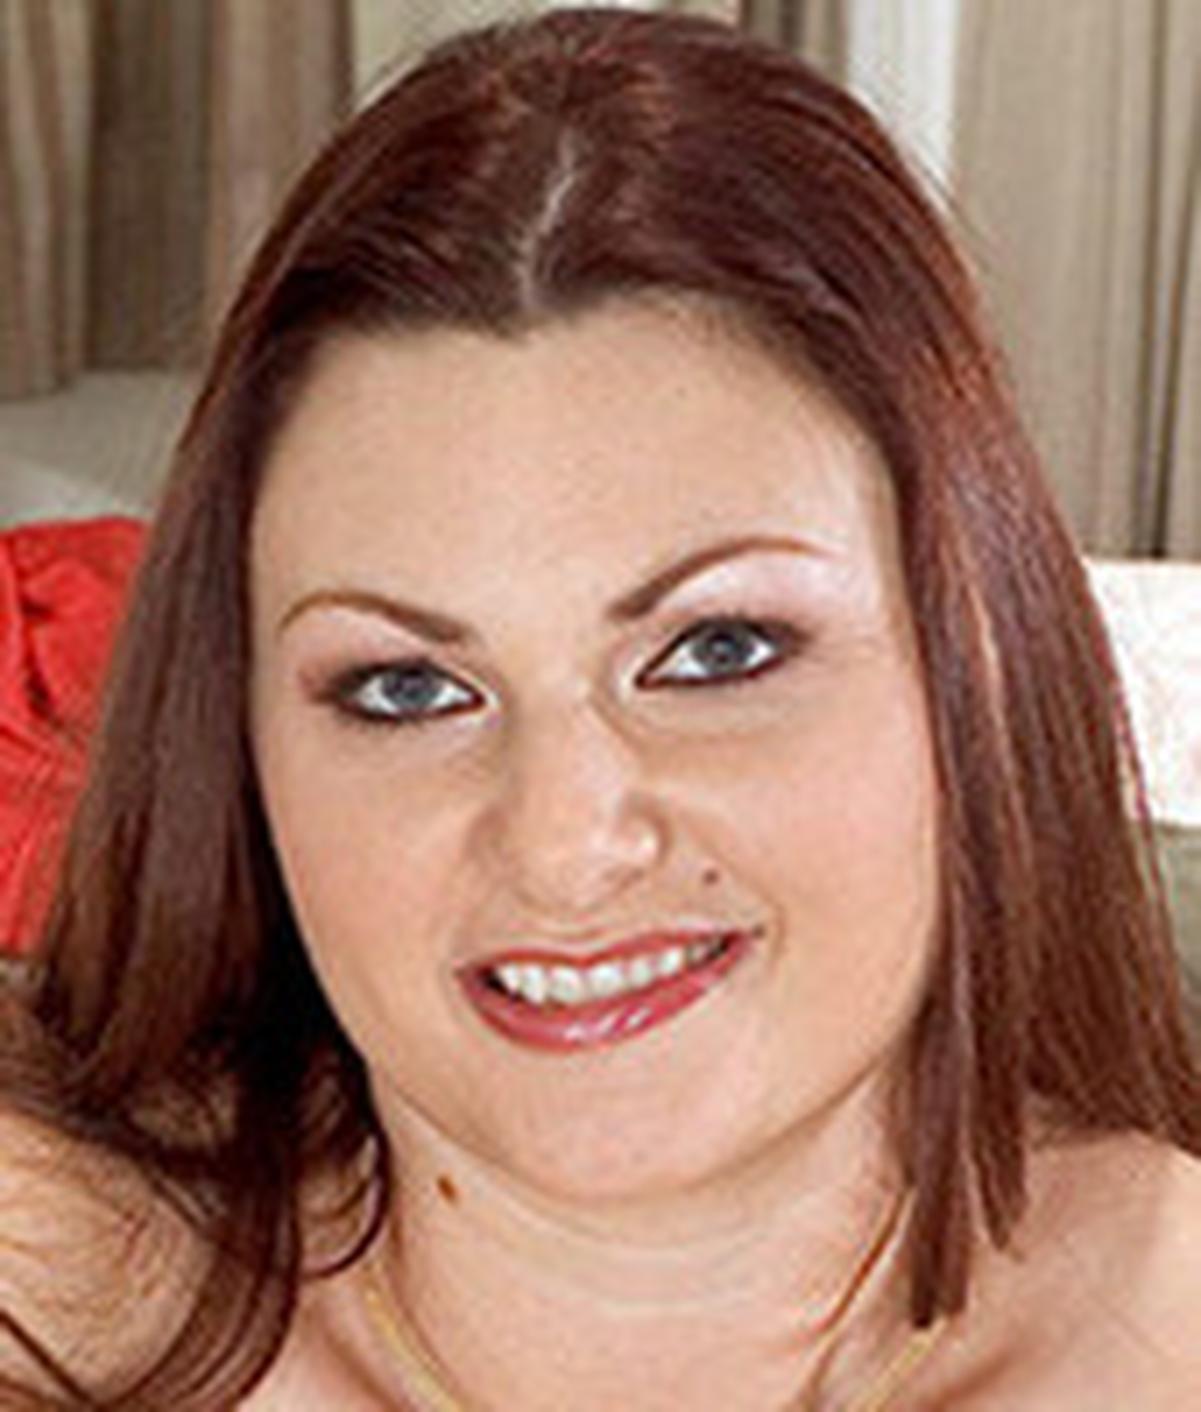 Sabryna Stone